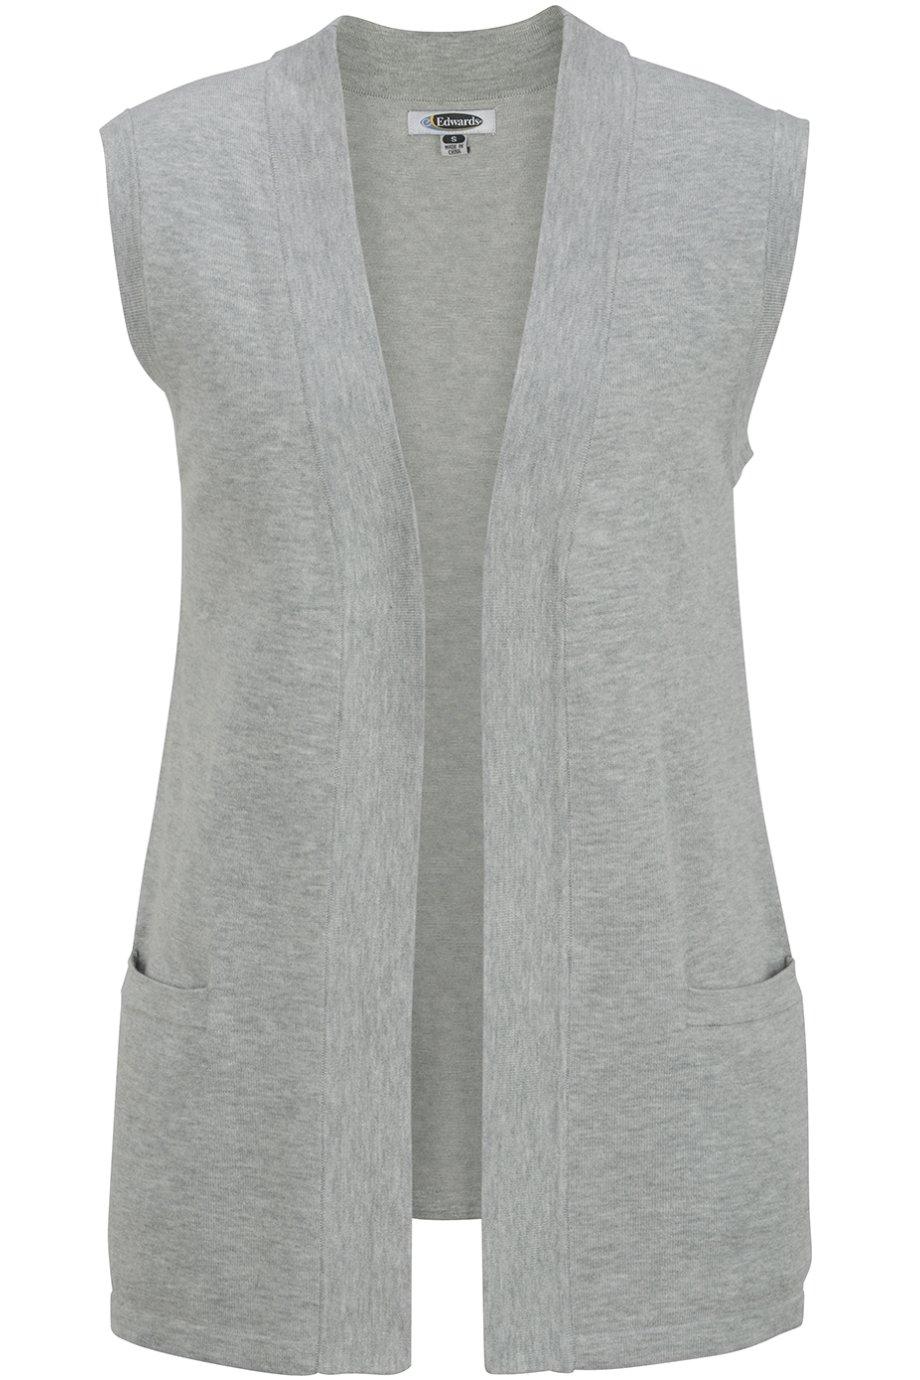 Edwards Women's Open Cardigan Sweater Vest, Grey Heather, Large by Edwards Garment (Image #1)